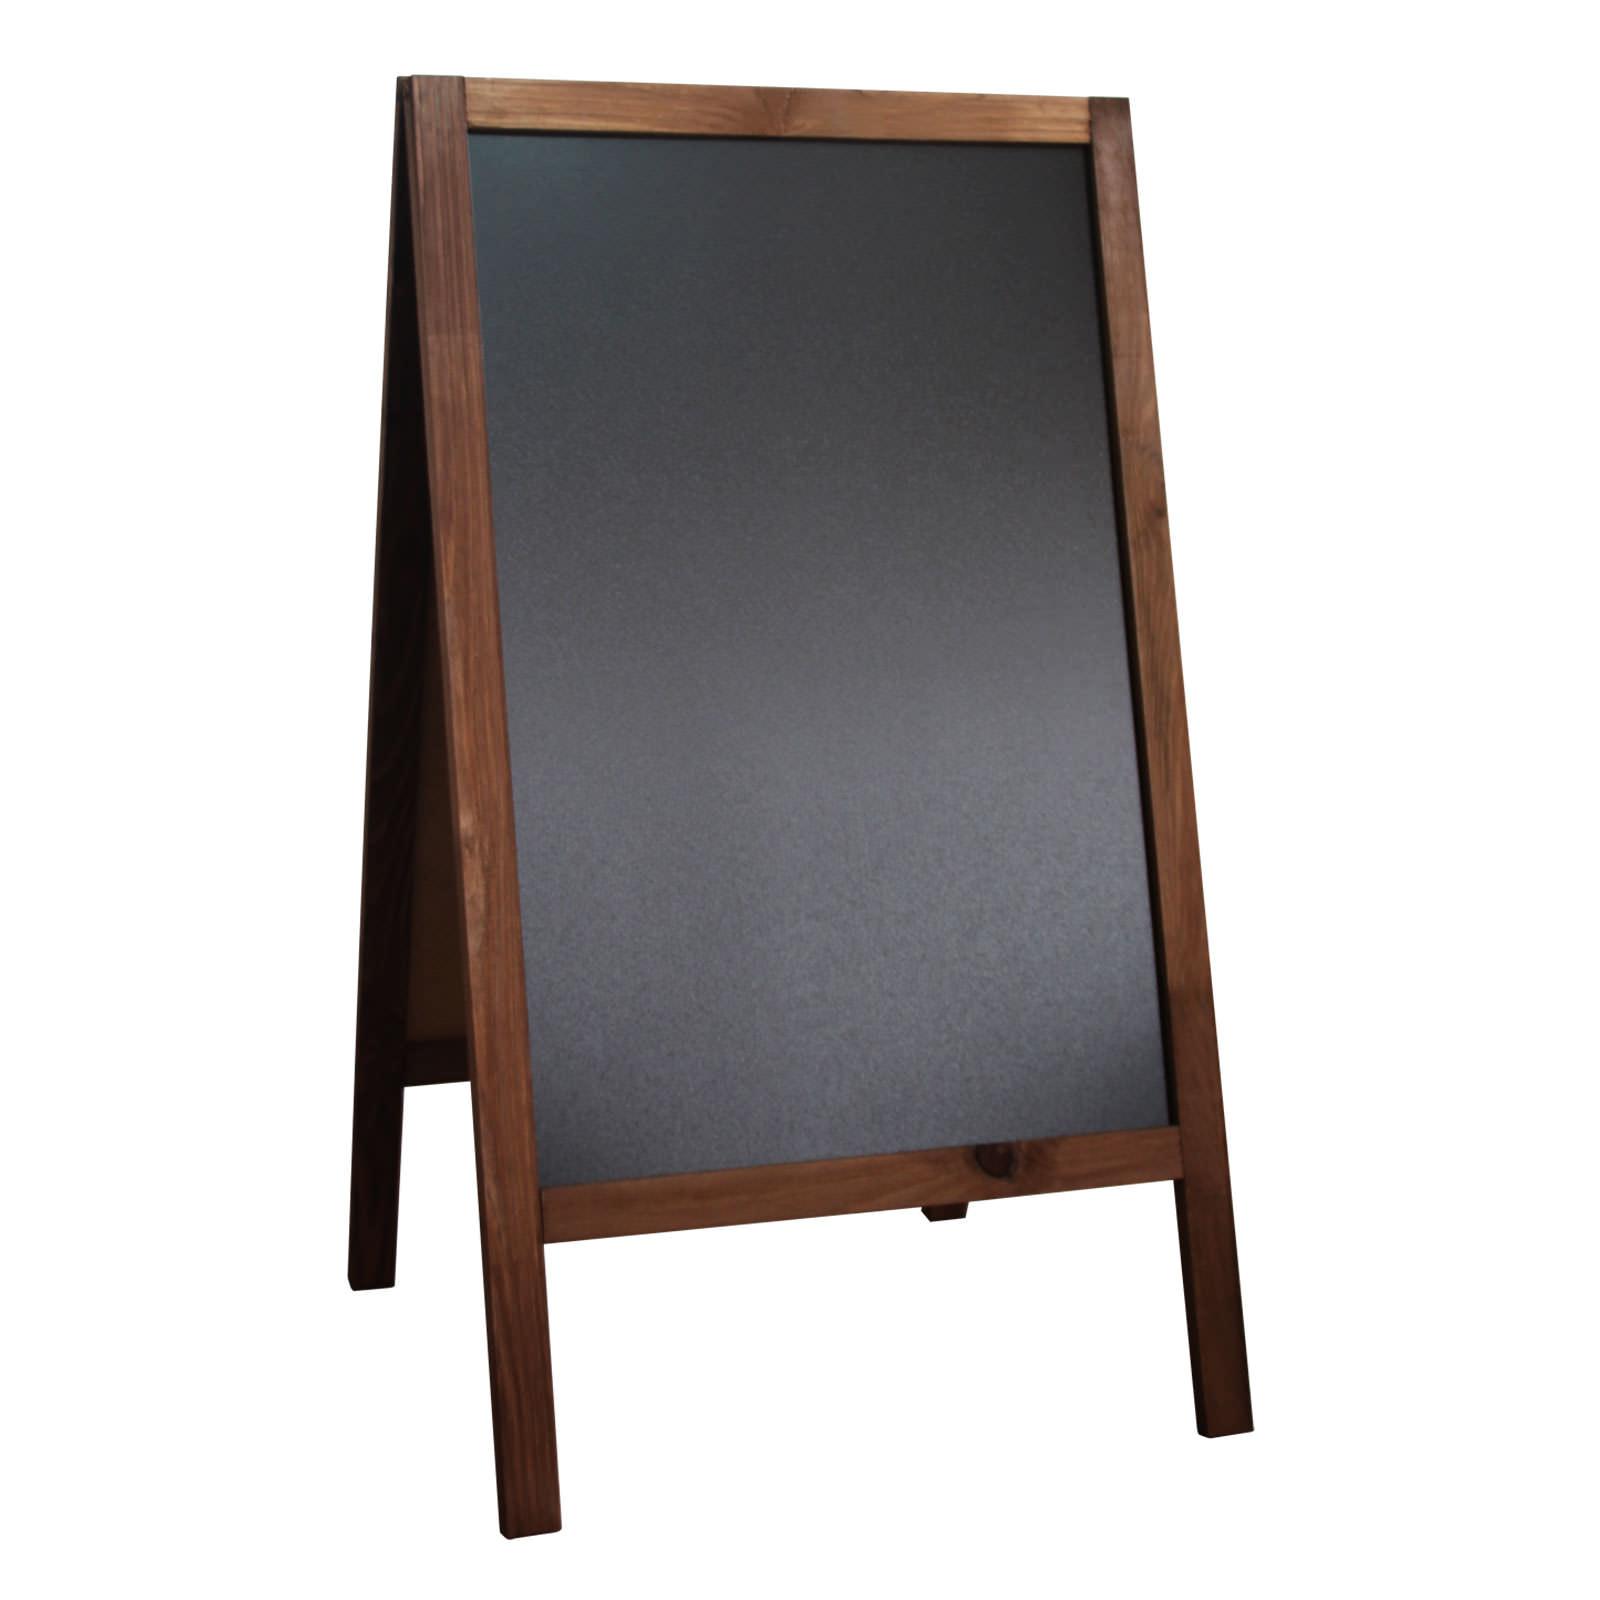 stra enaufsteller kreidetafel kundenstopper holzaufsteller beidseitig holz ebay. Black Bedroom Furniture Sets. Home Design Ideas